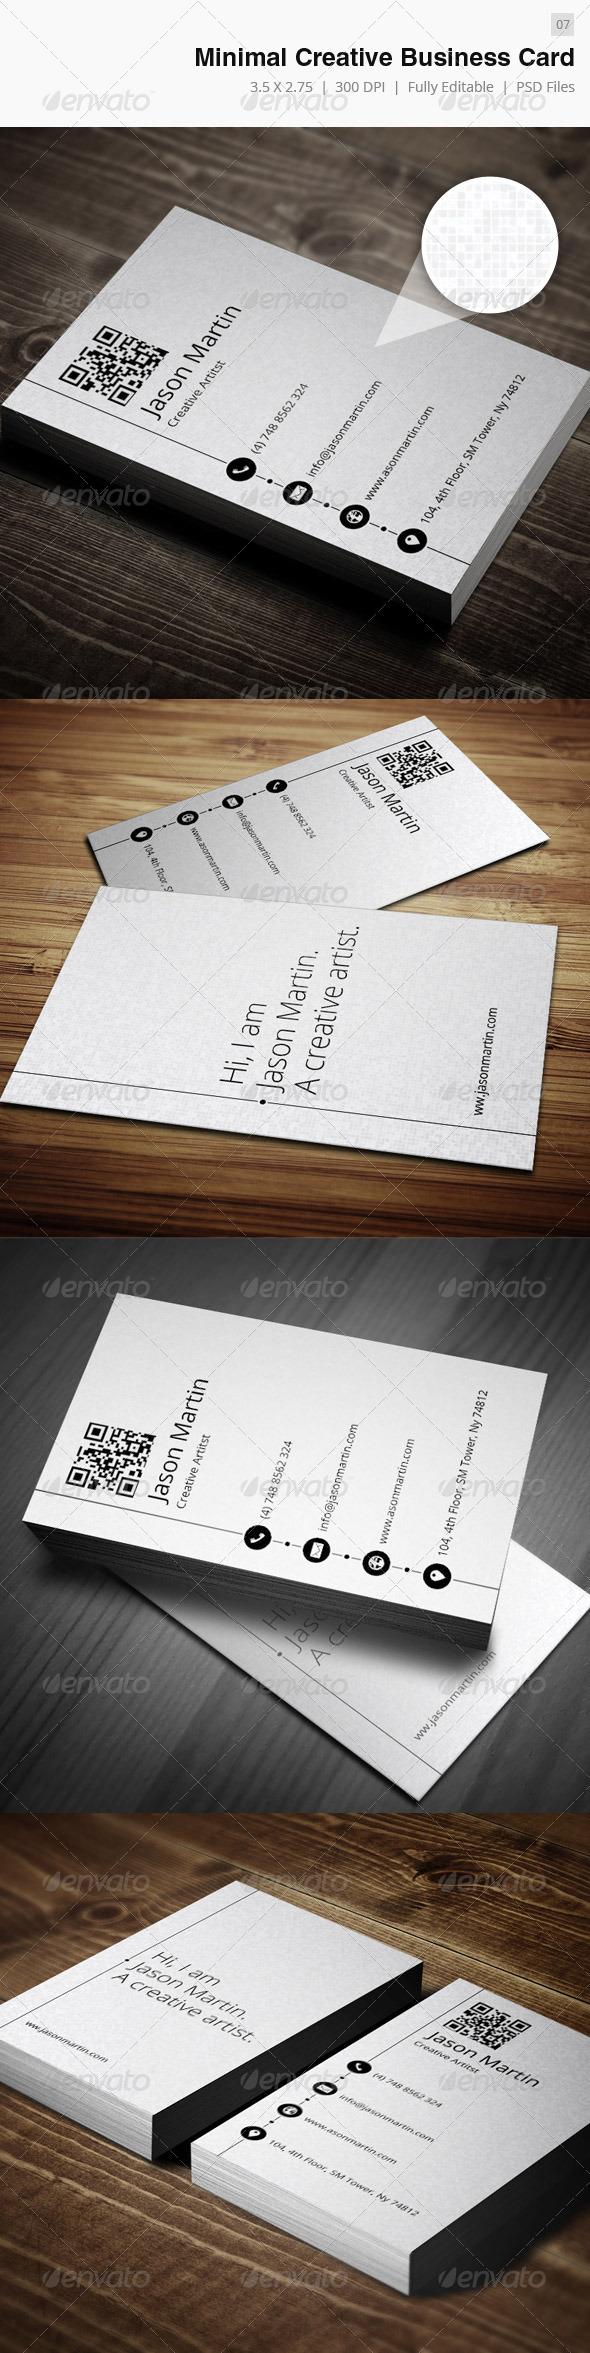 GraphicRiver Creative Minimal Business Card 4065268